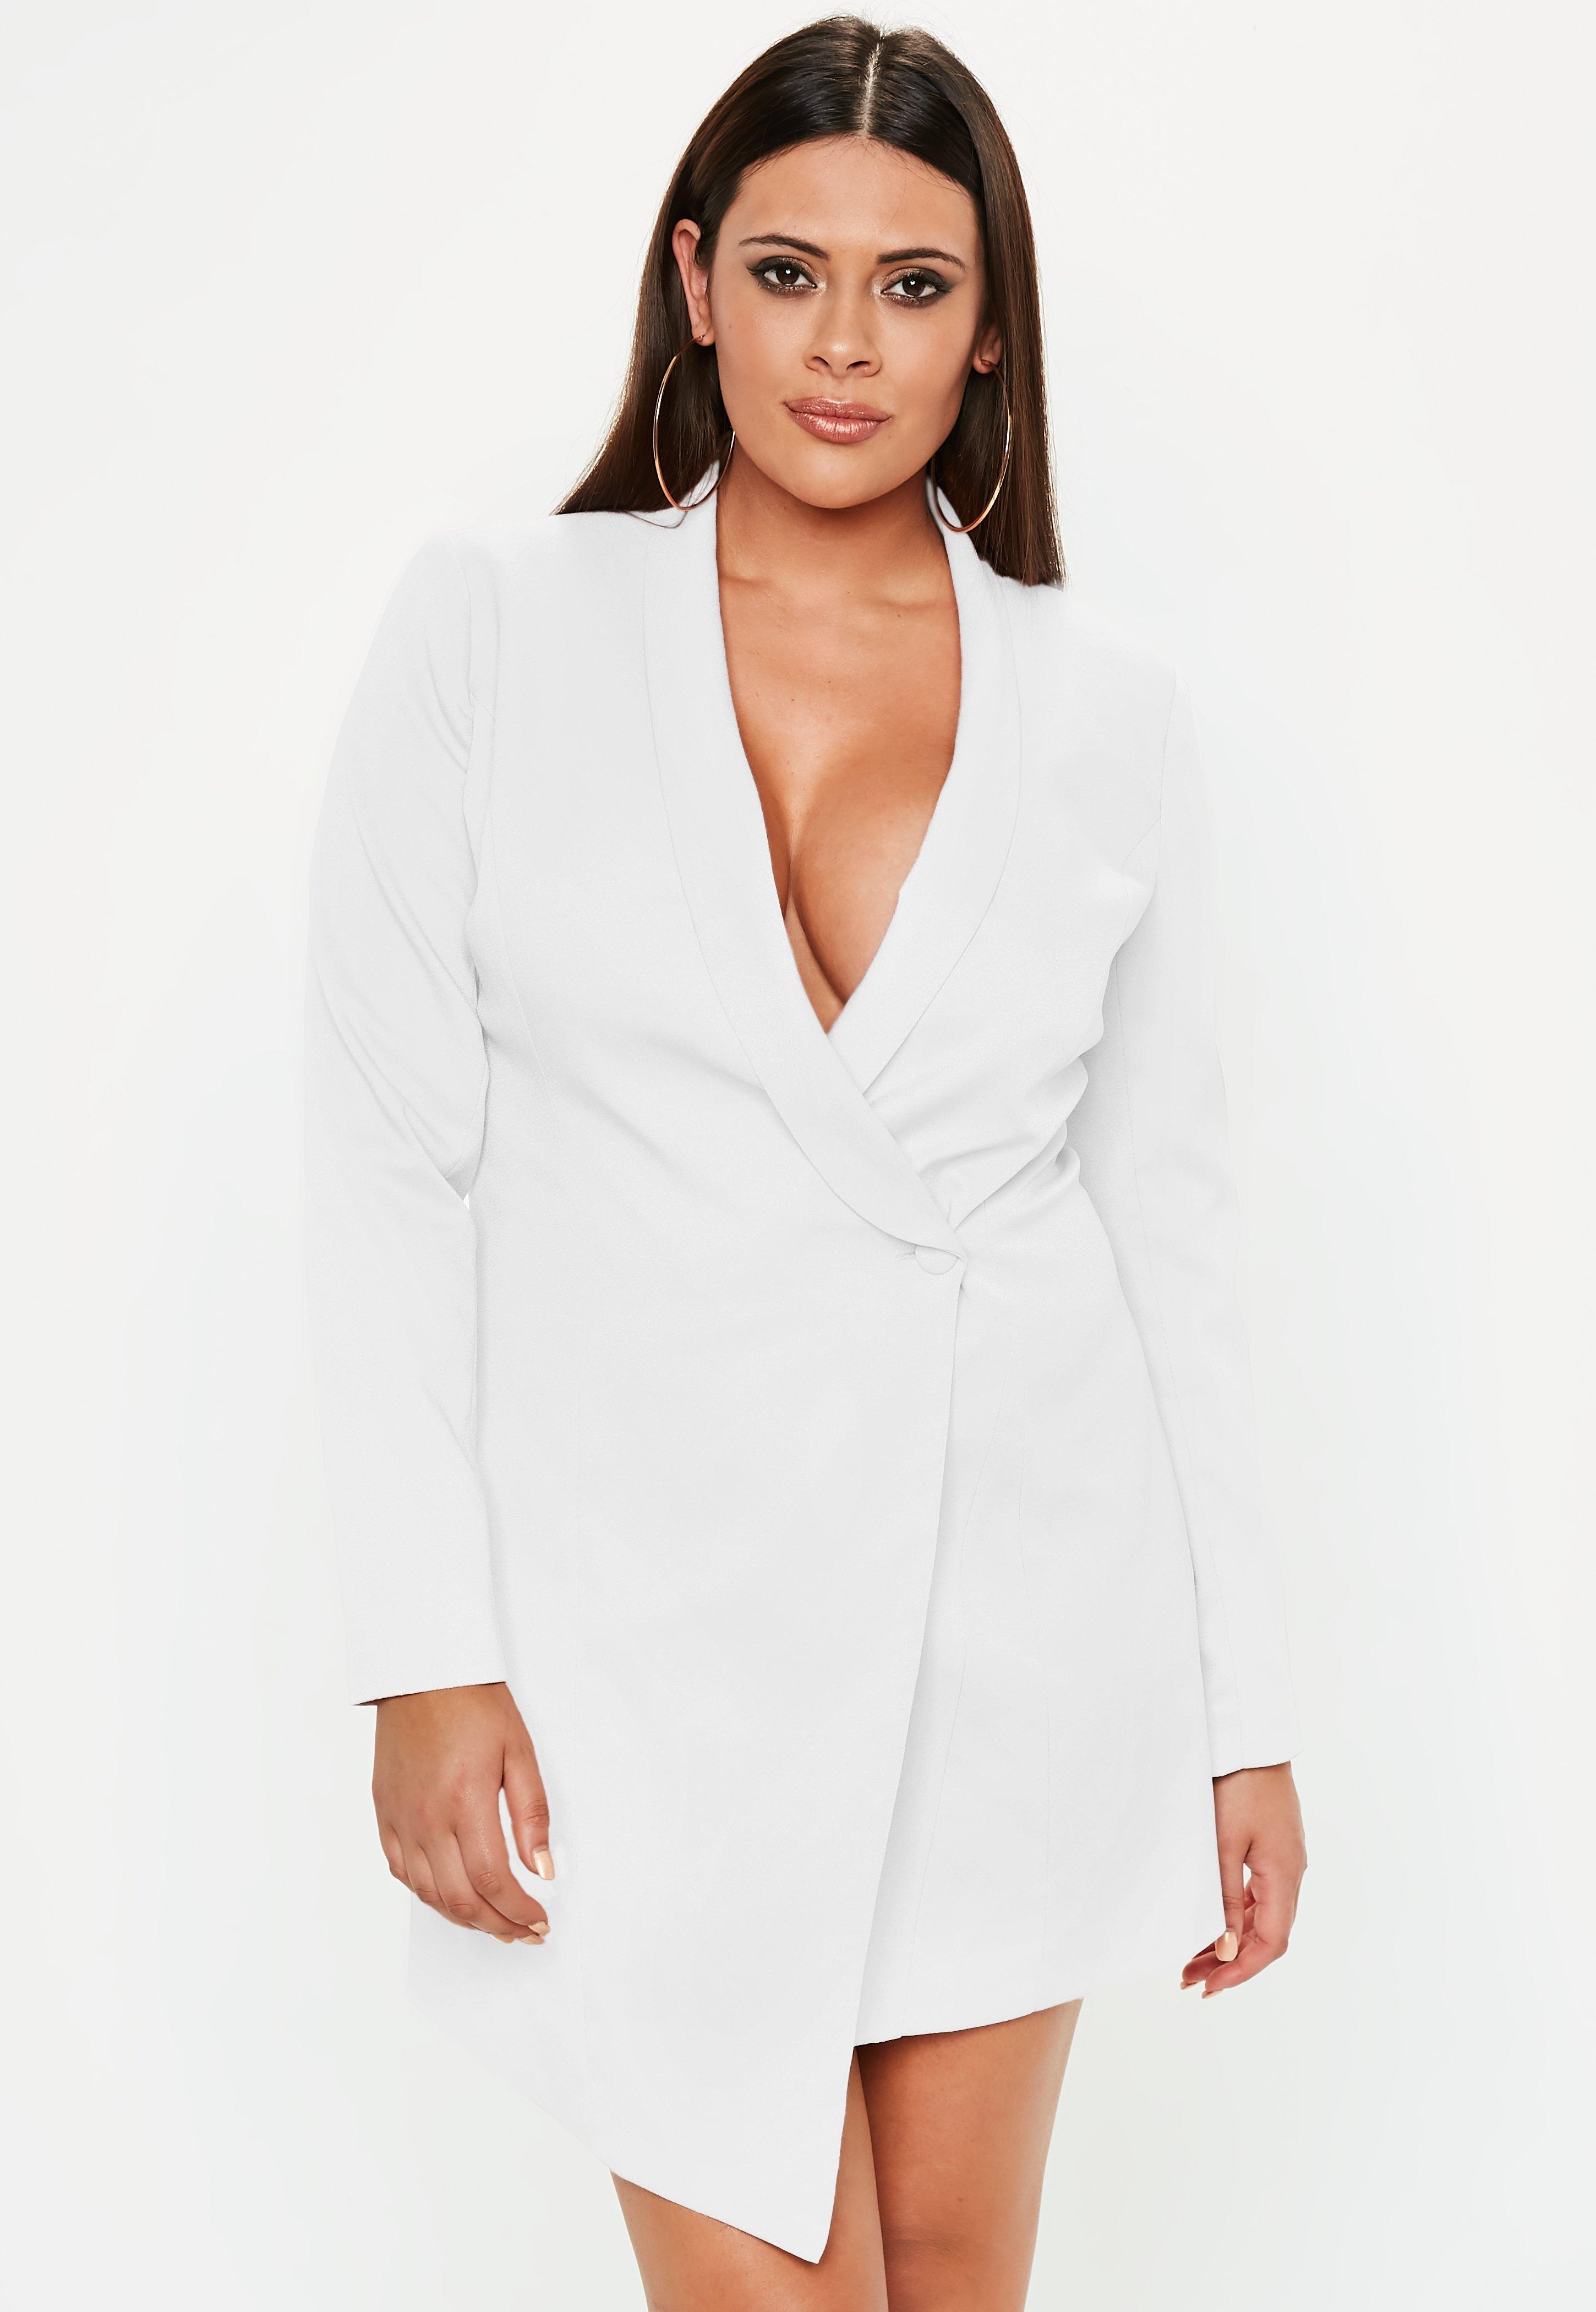 Veste tailleur femme taille 32